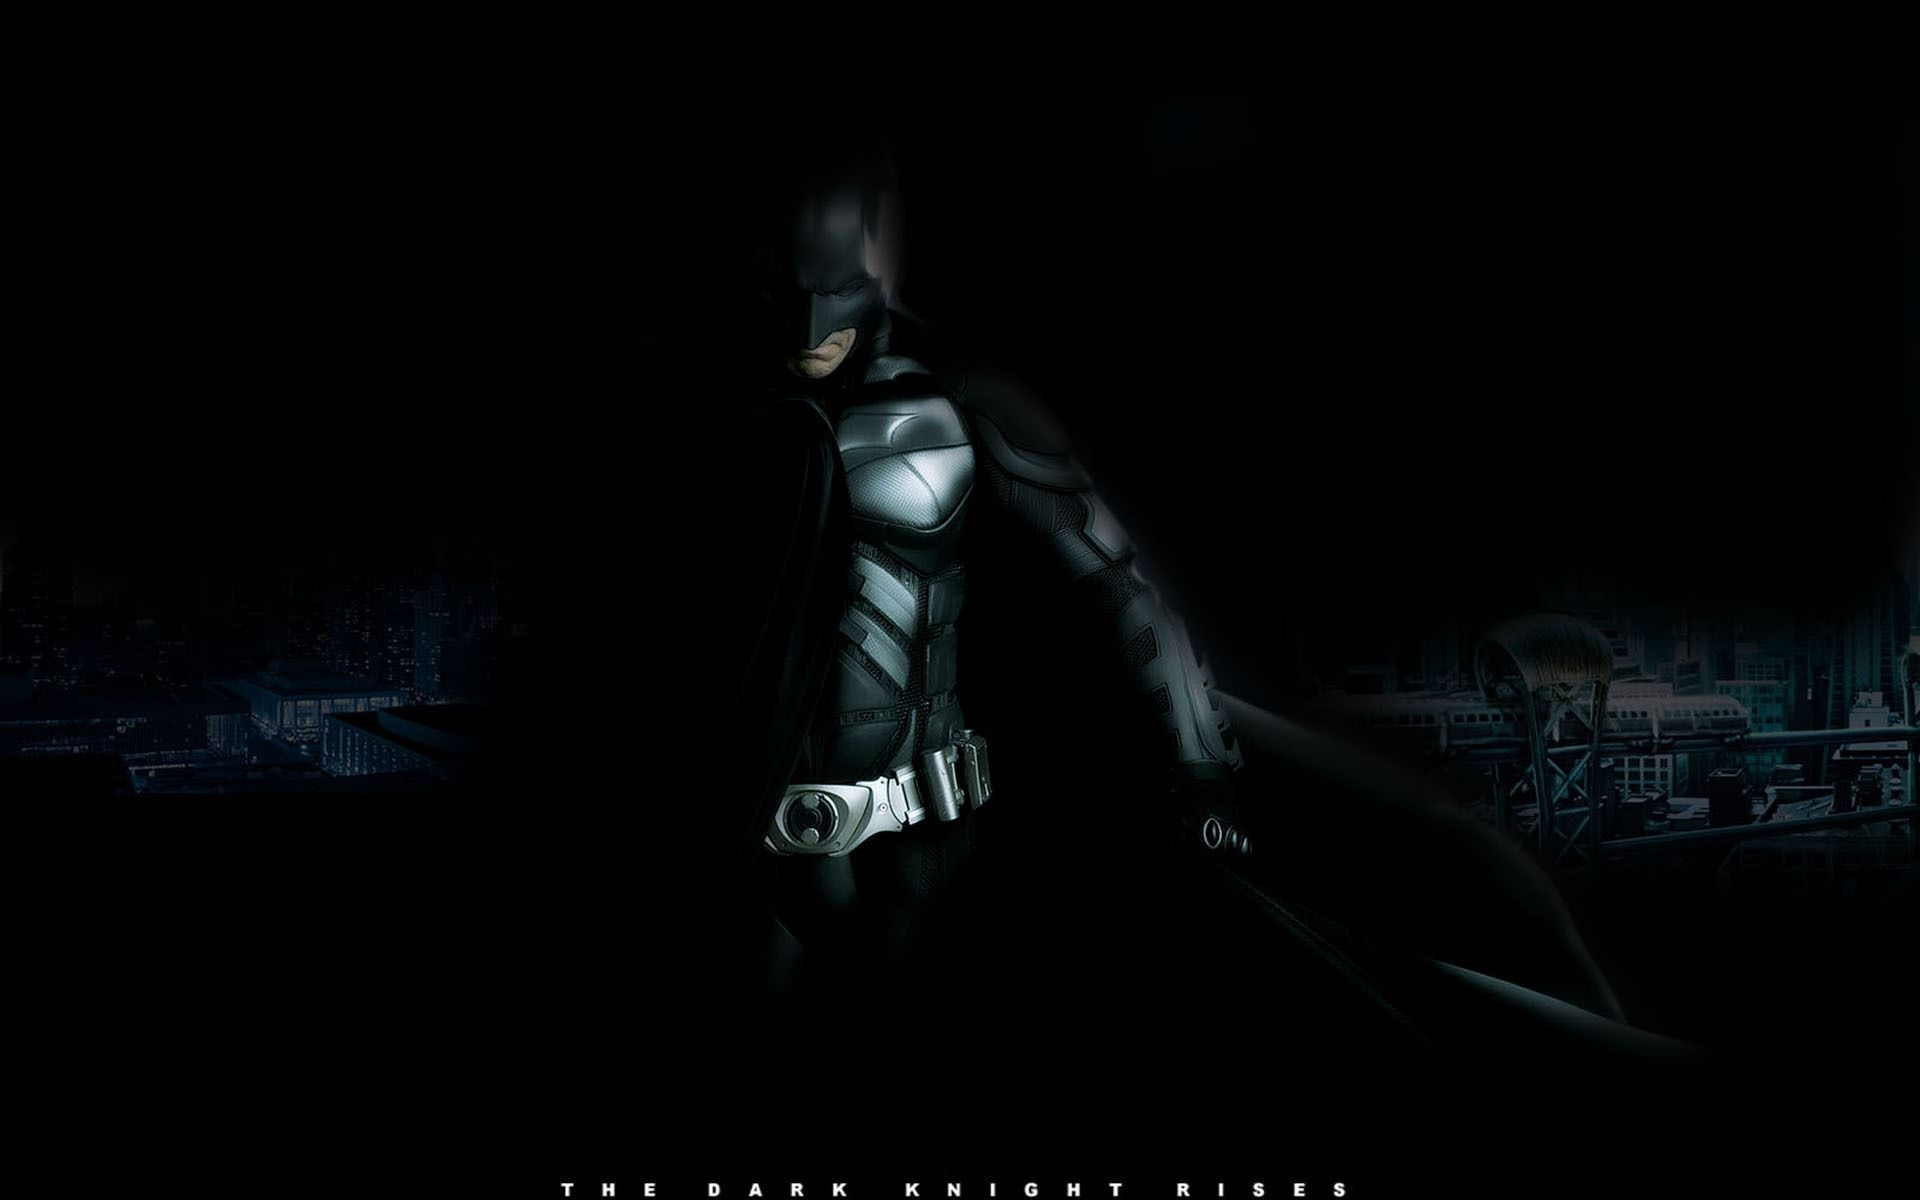 dark knight wallpapers busca full hd wallpaper batman